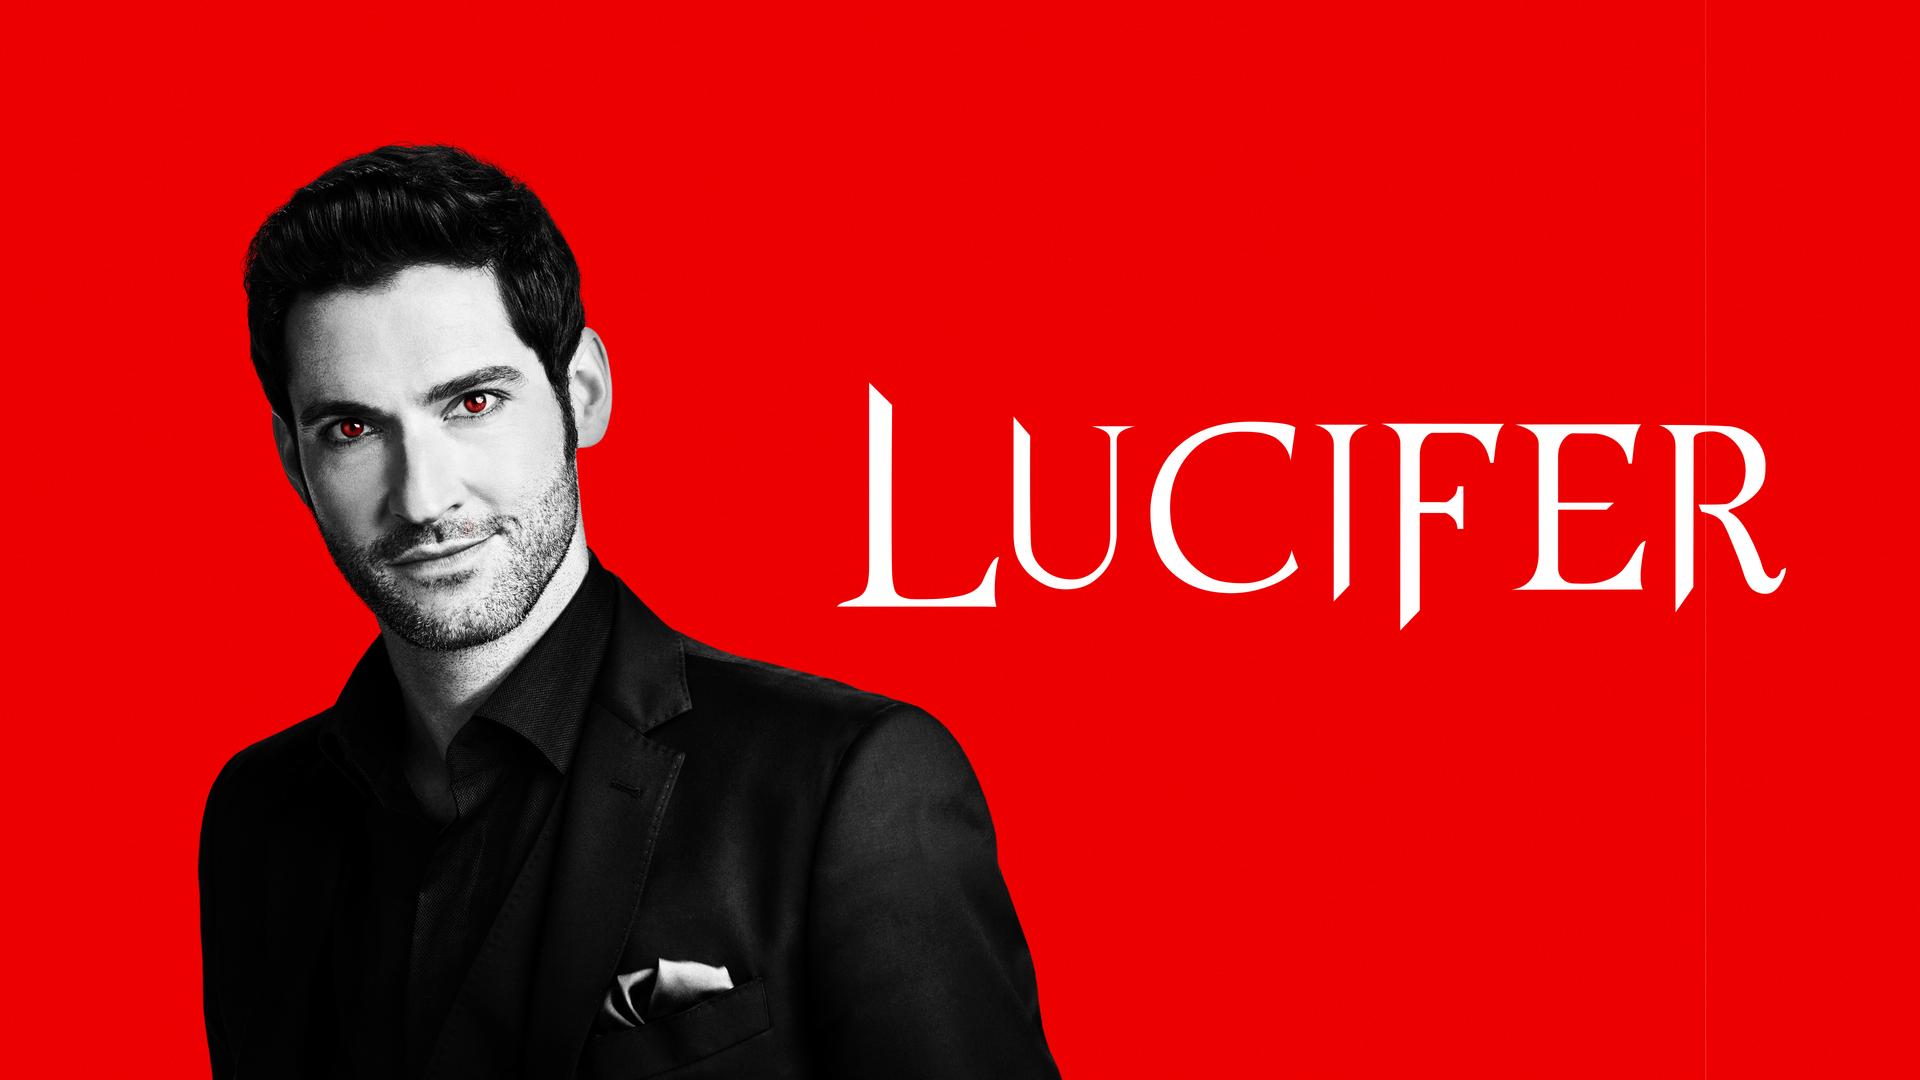 1920x1080 2017 Lucifer Season 3 4k Laptop Full HD 1080P HD